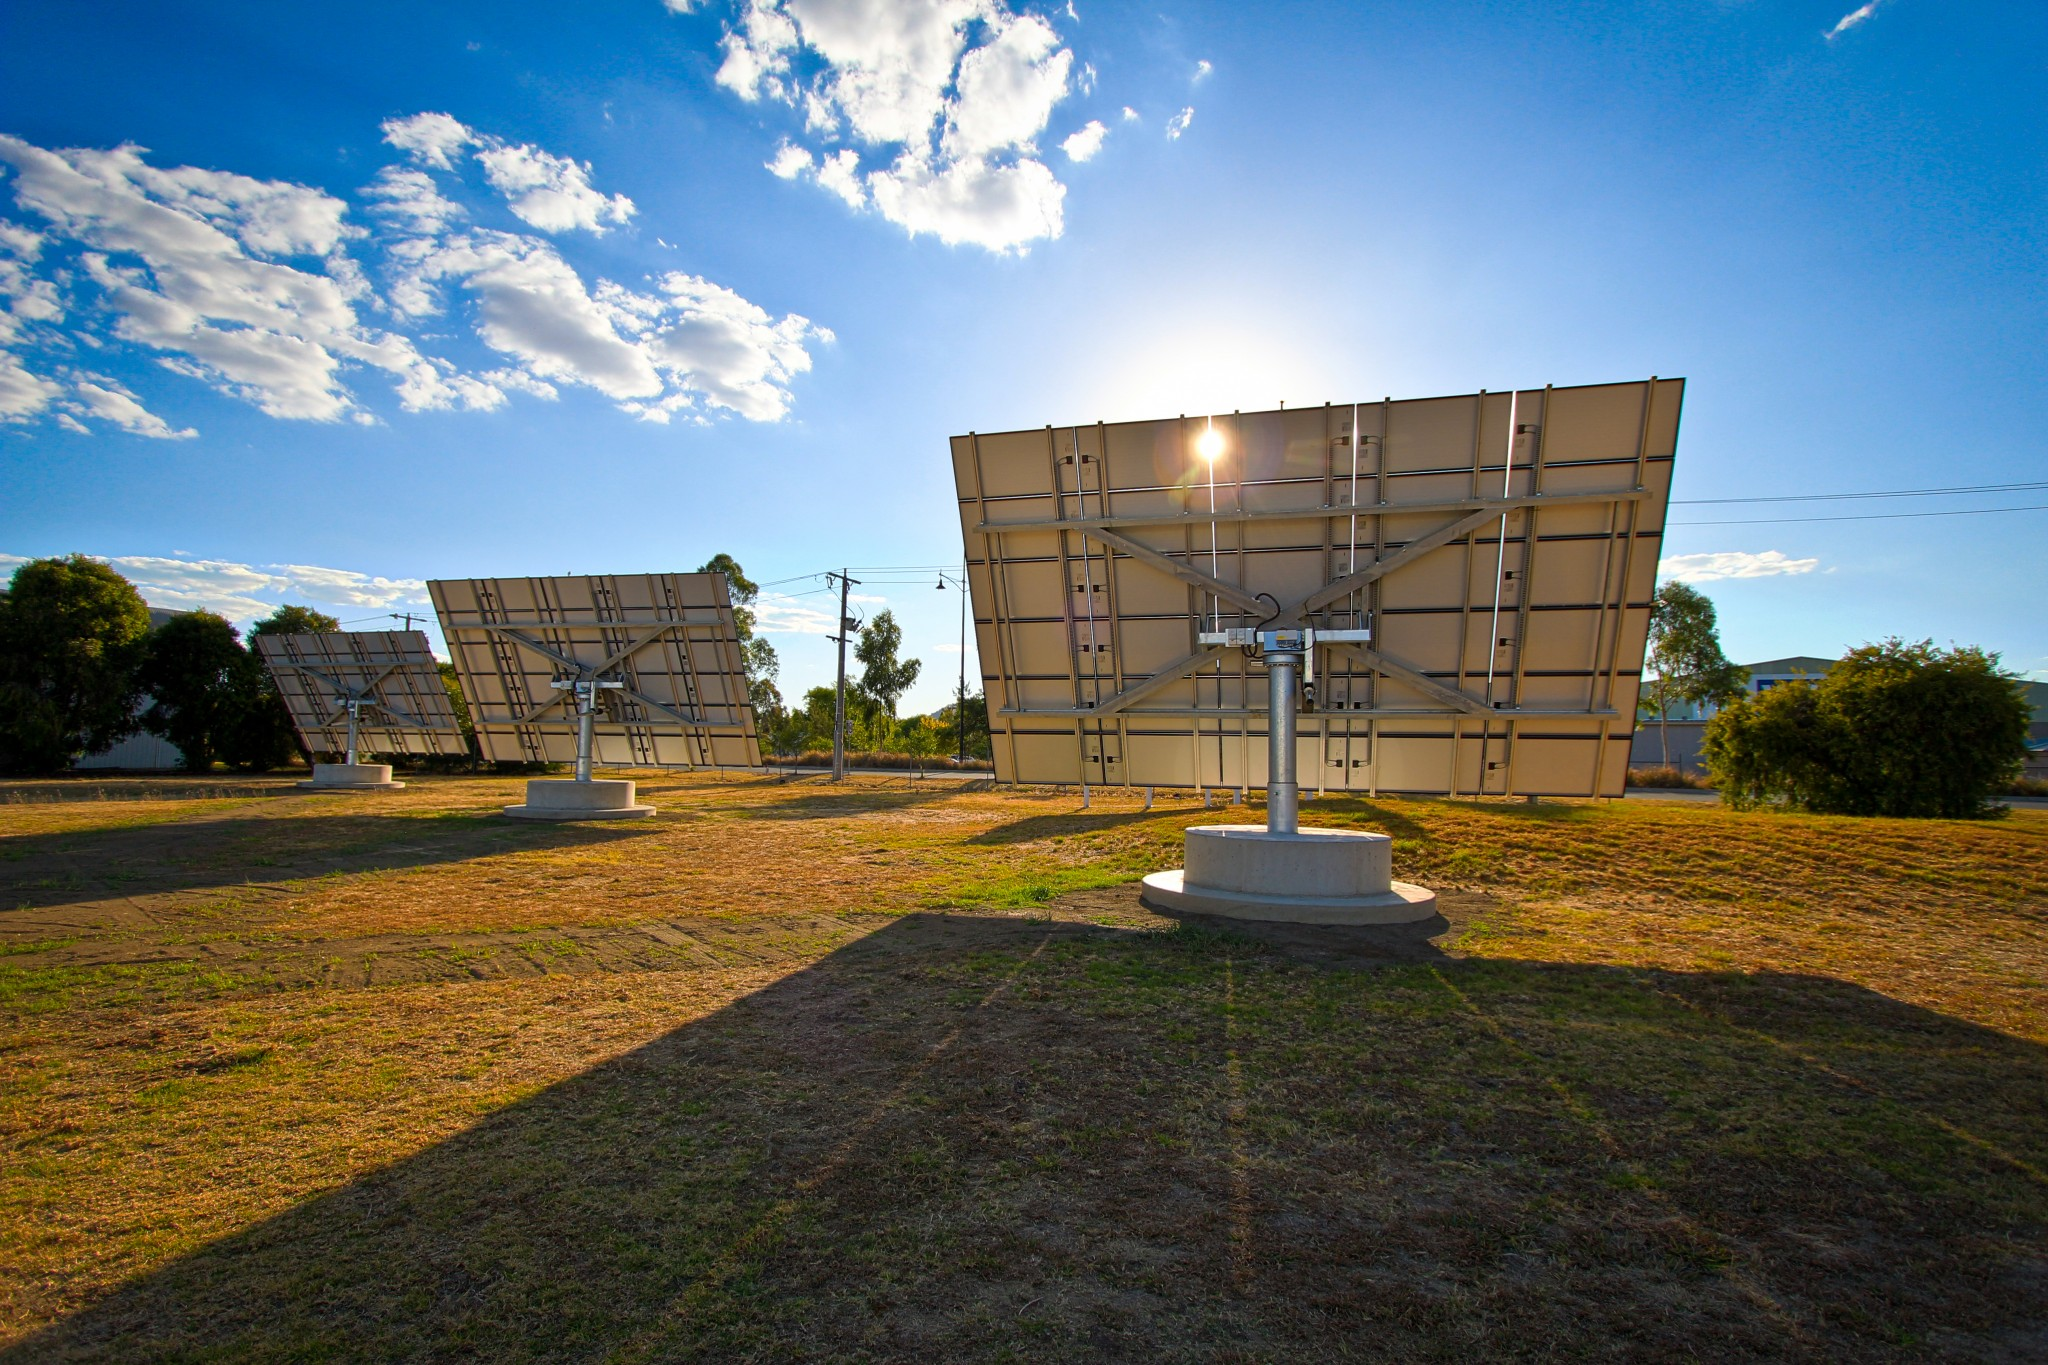 solar-tracking-system-2-glynncorp-electrical-jpg